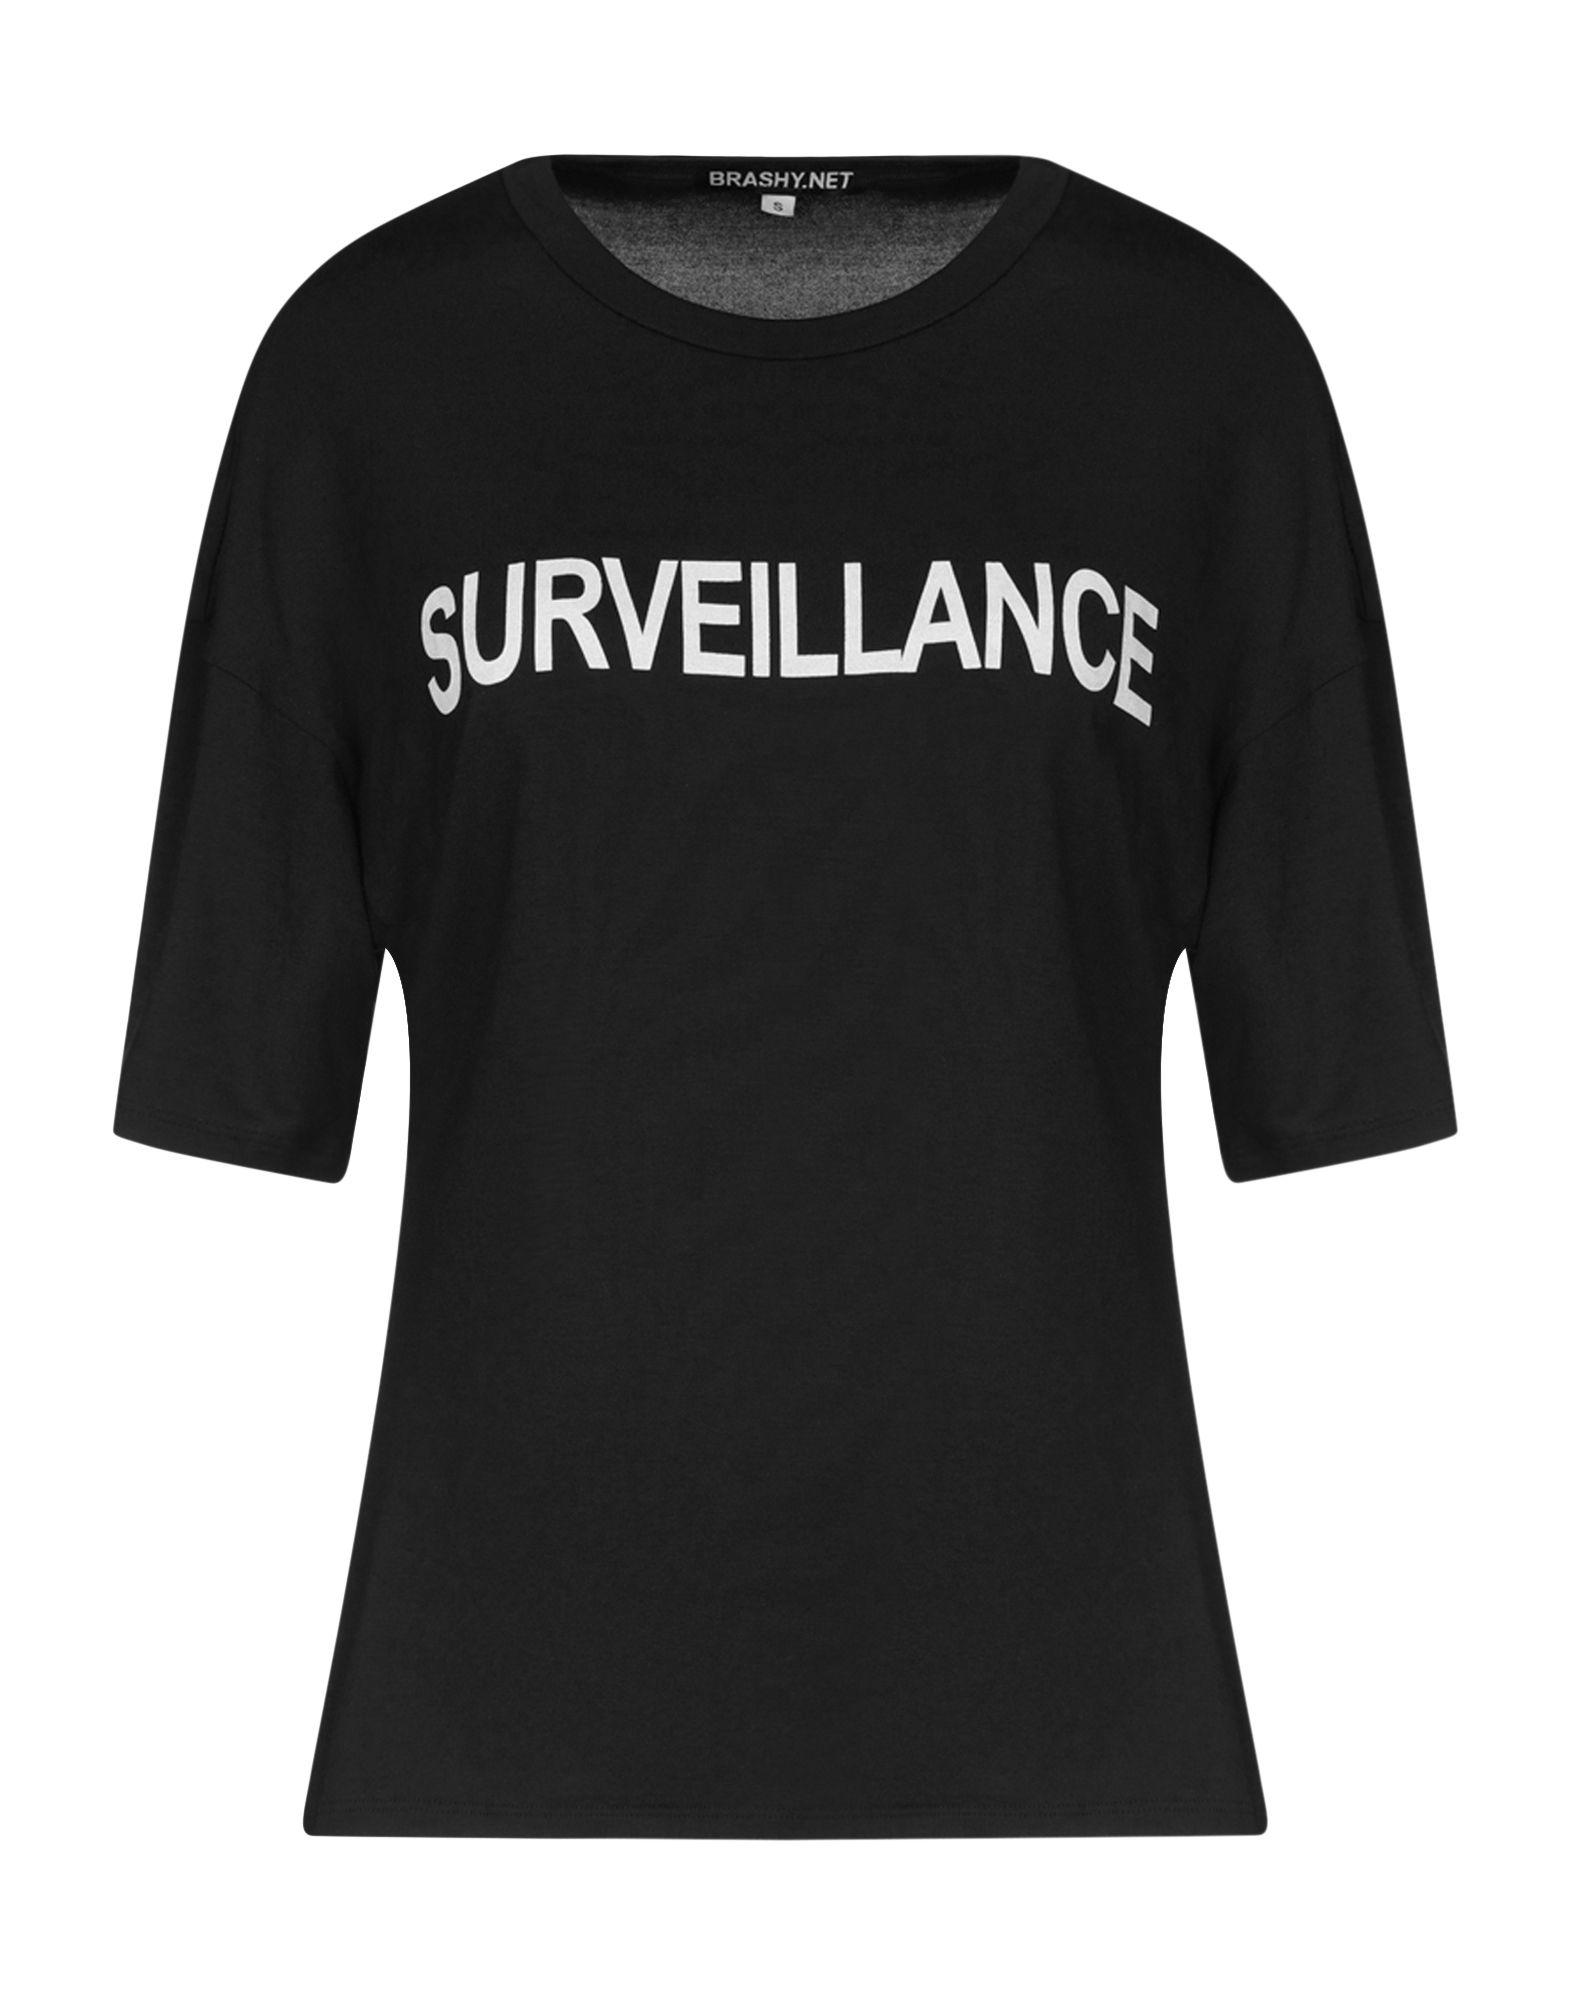 BRASHY T-Shirts in Black